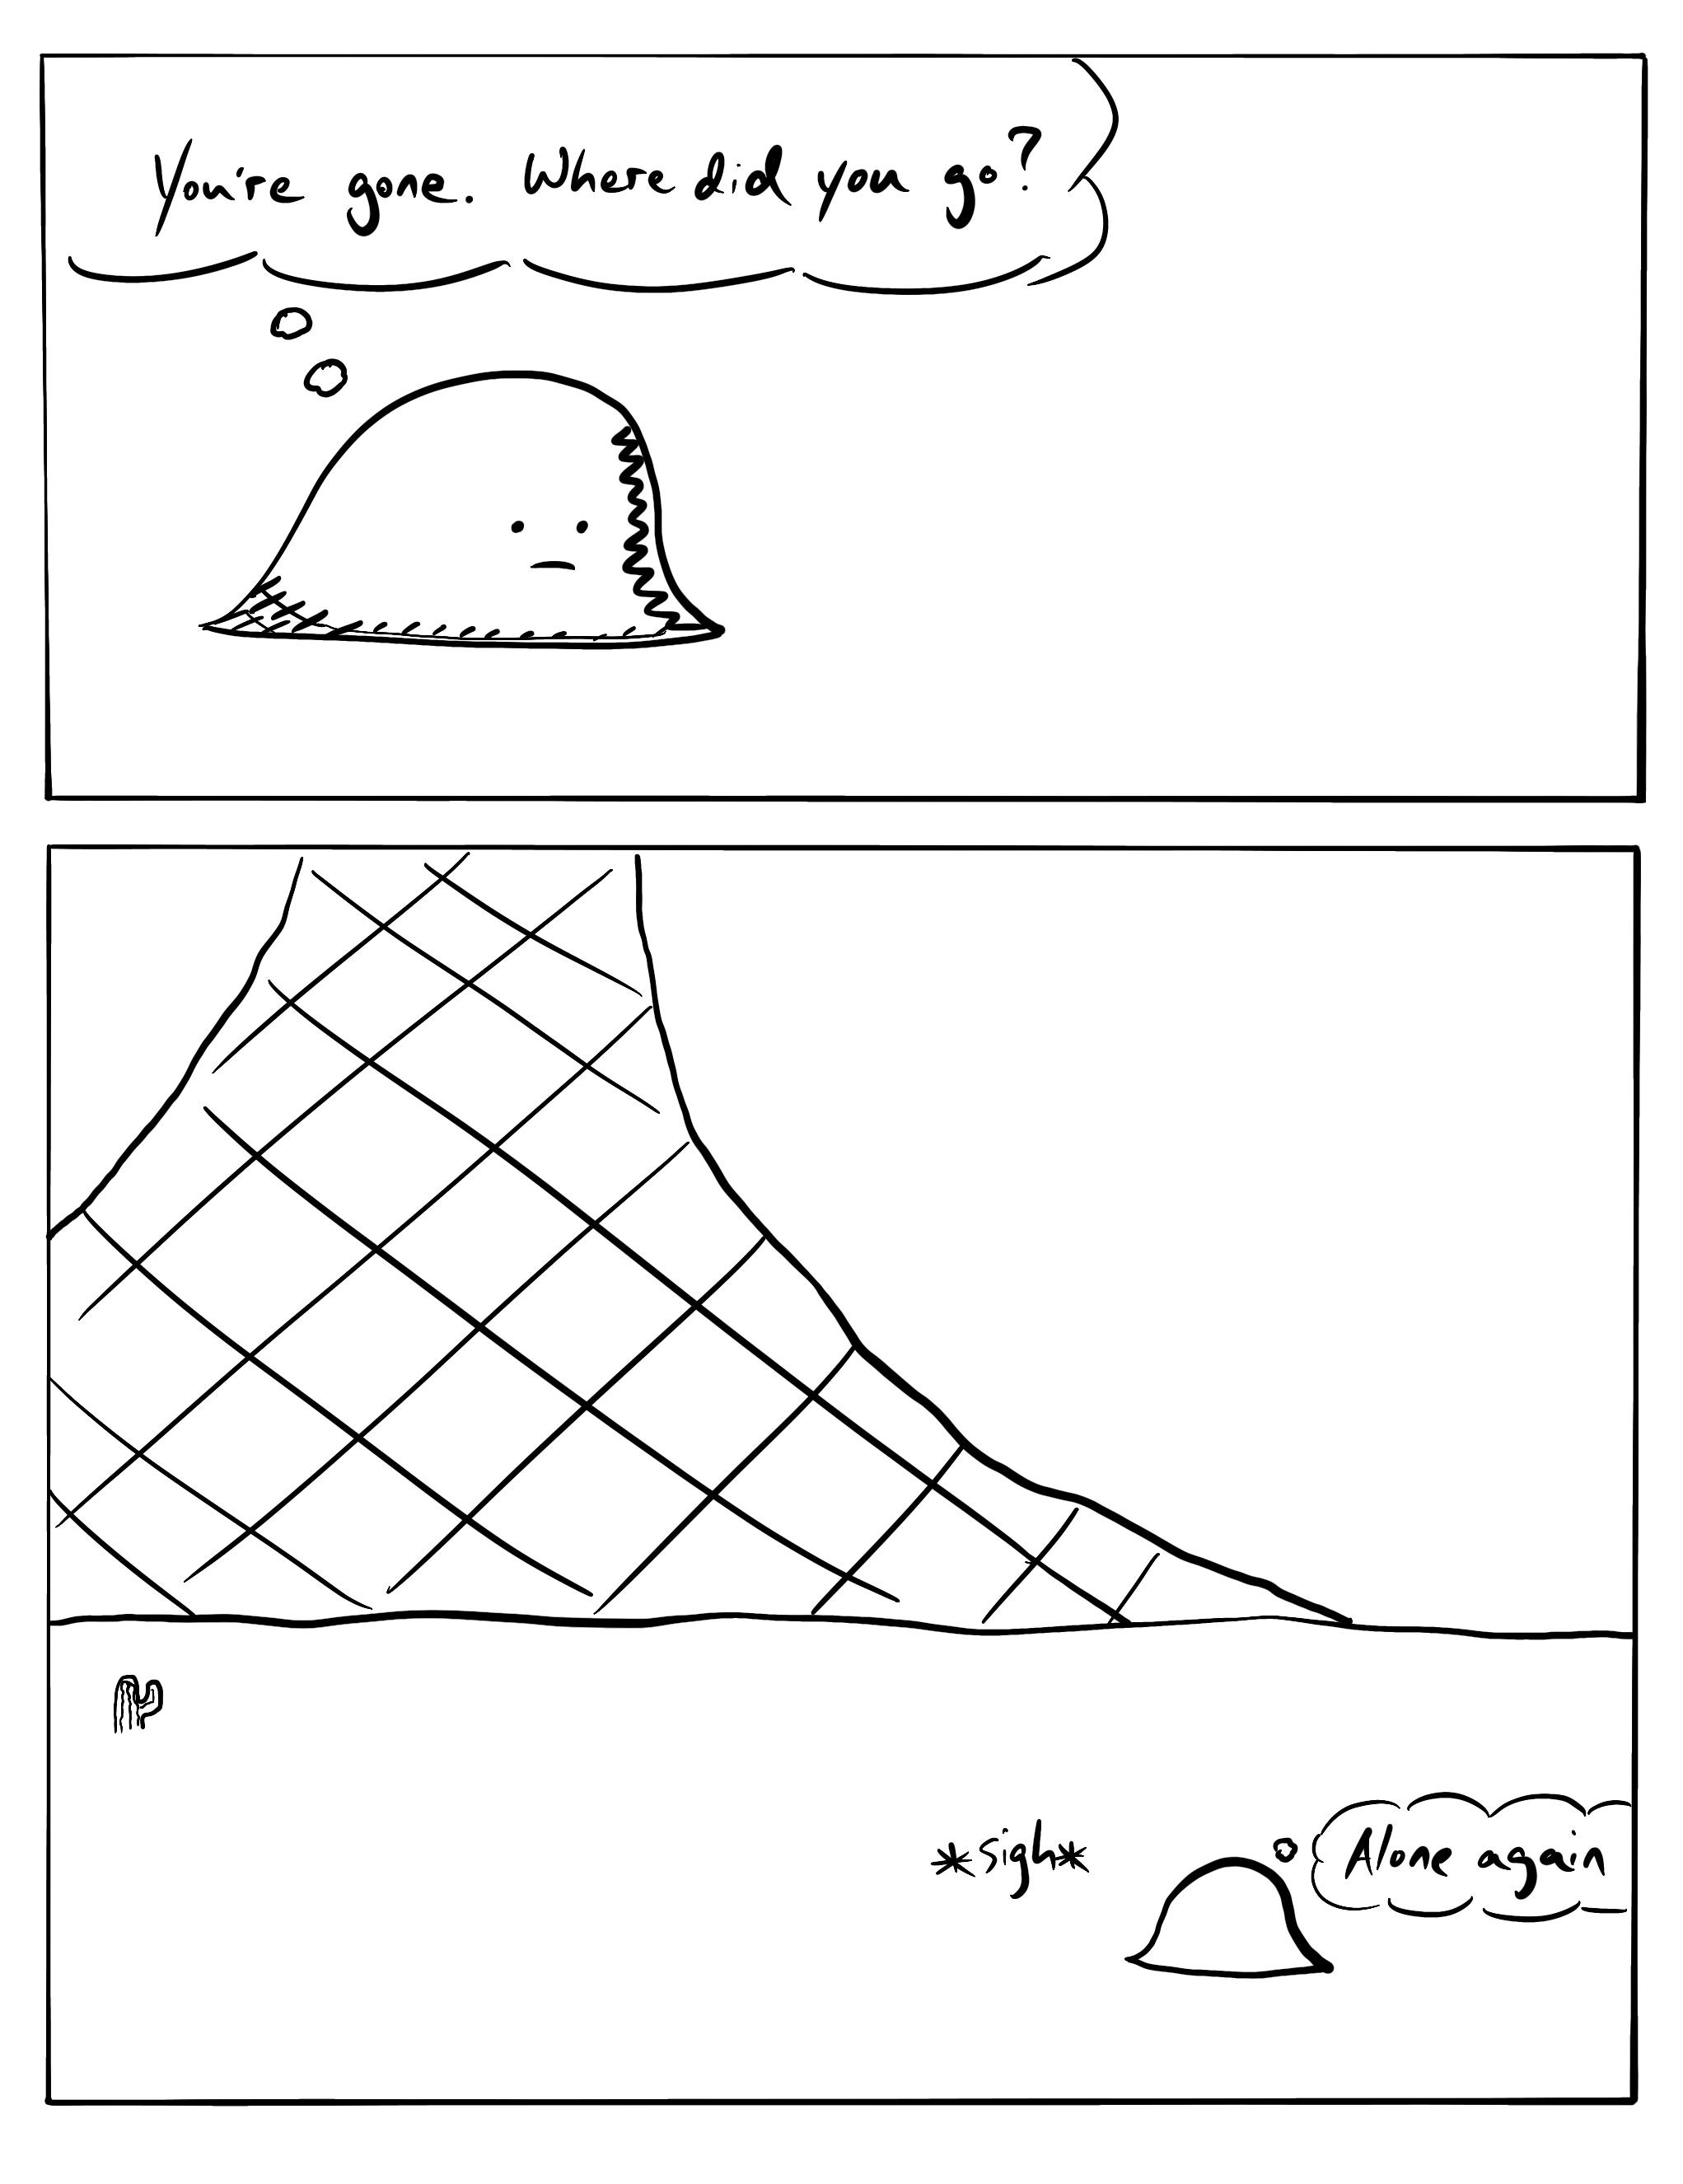 Comic_Digital_7.jpg